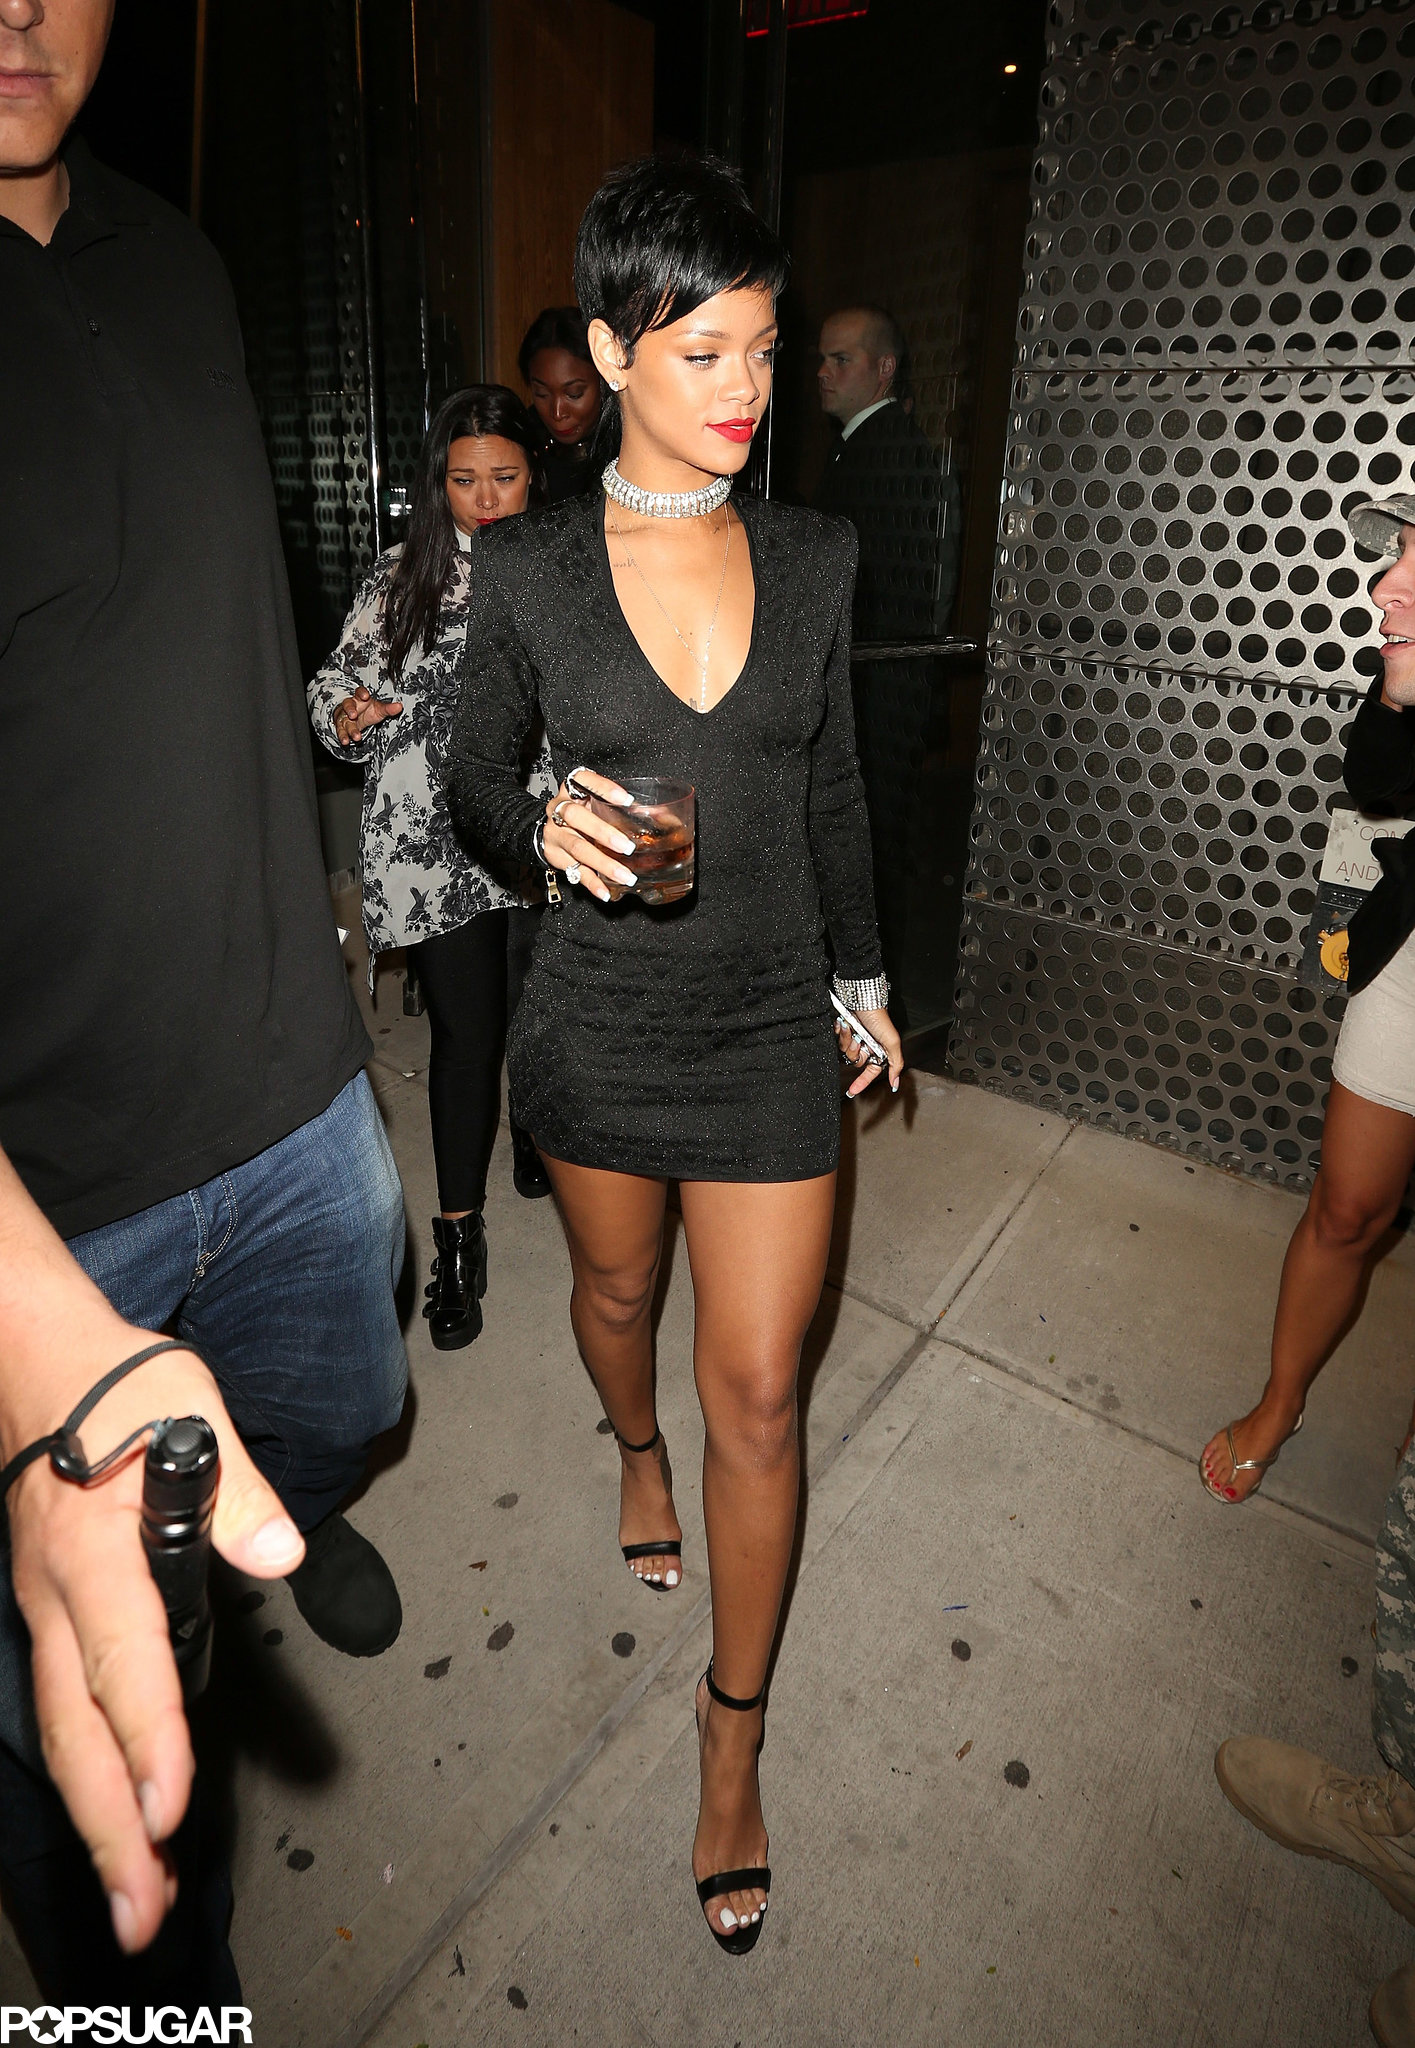 Rihanna Wore a Tight Black